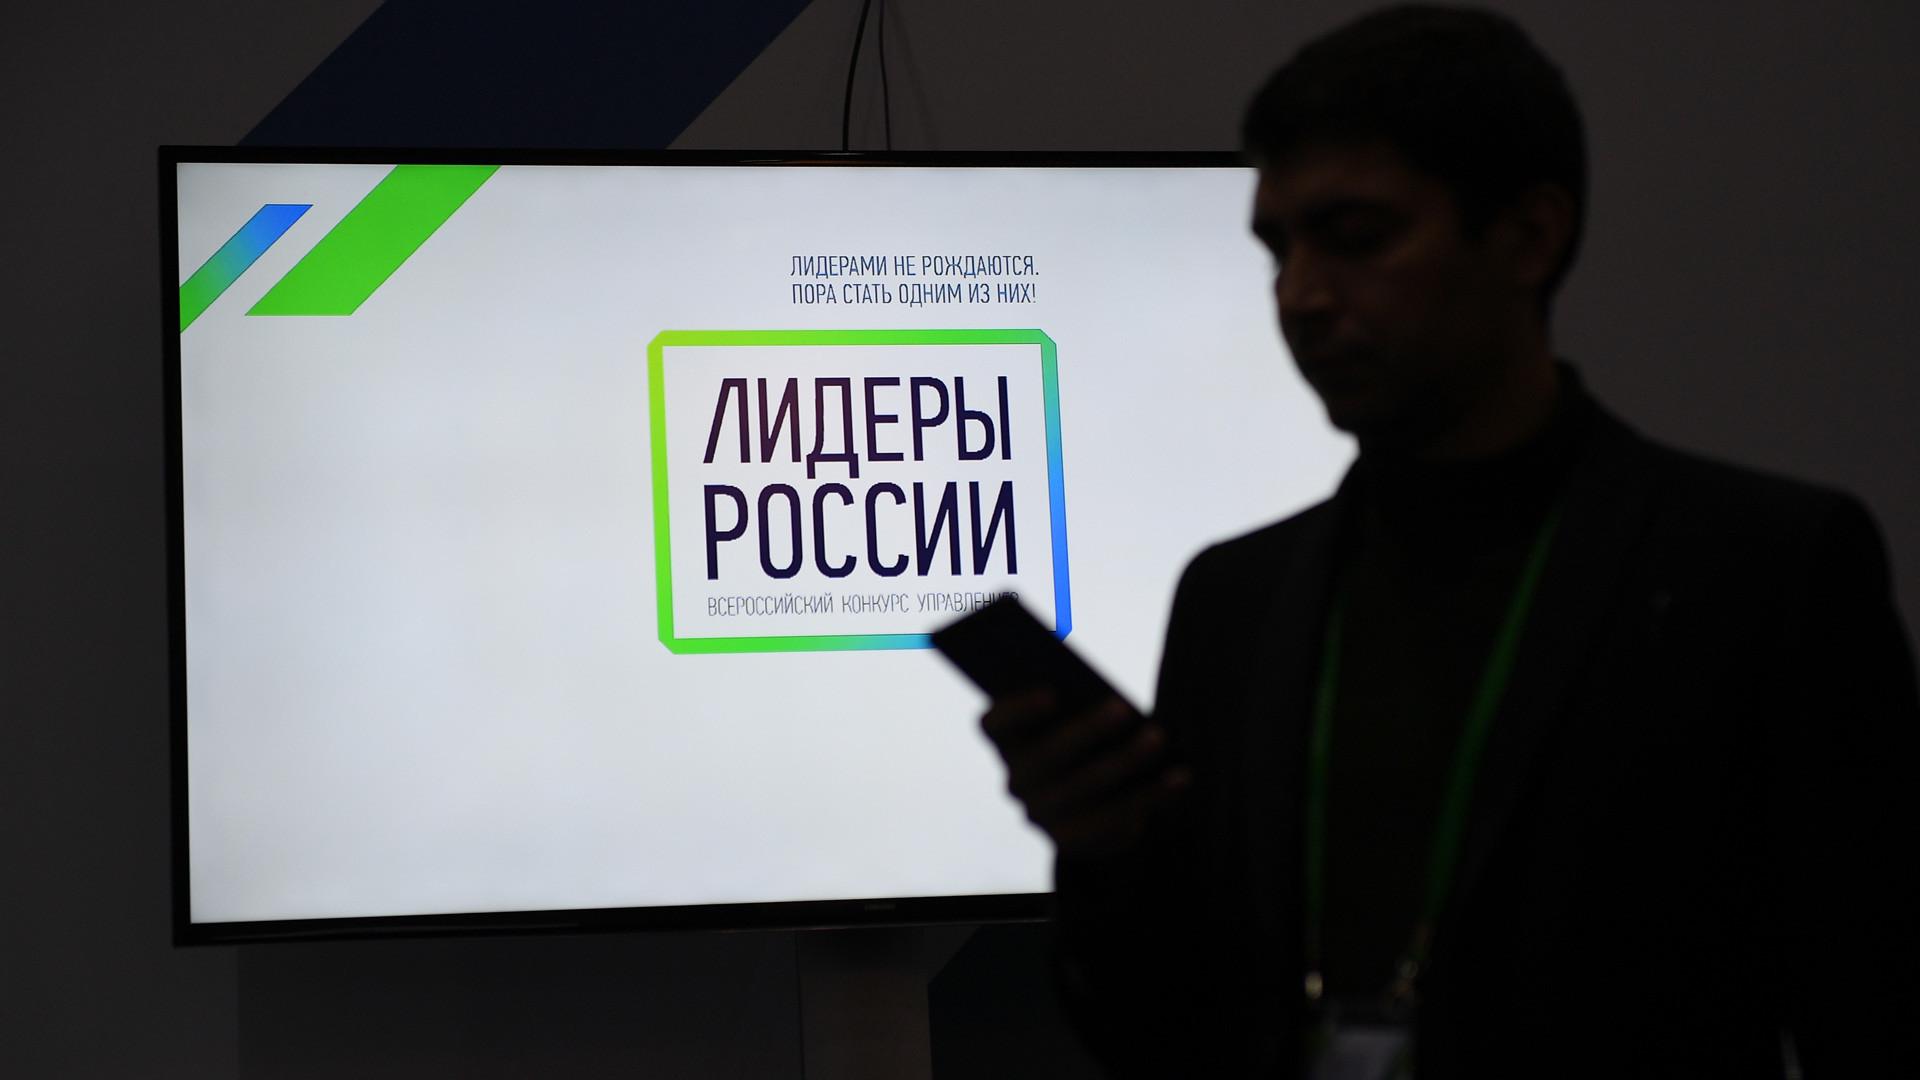 <p>Фото: &copy;&nbsp;РИА Новости/Нина Зотина</p>